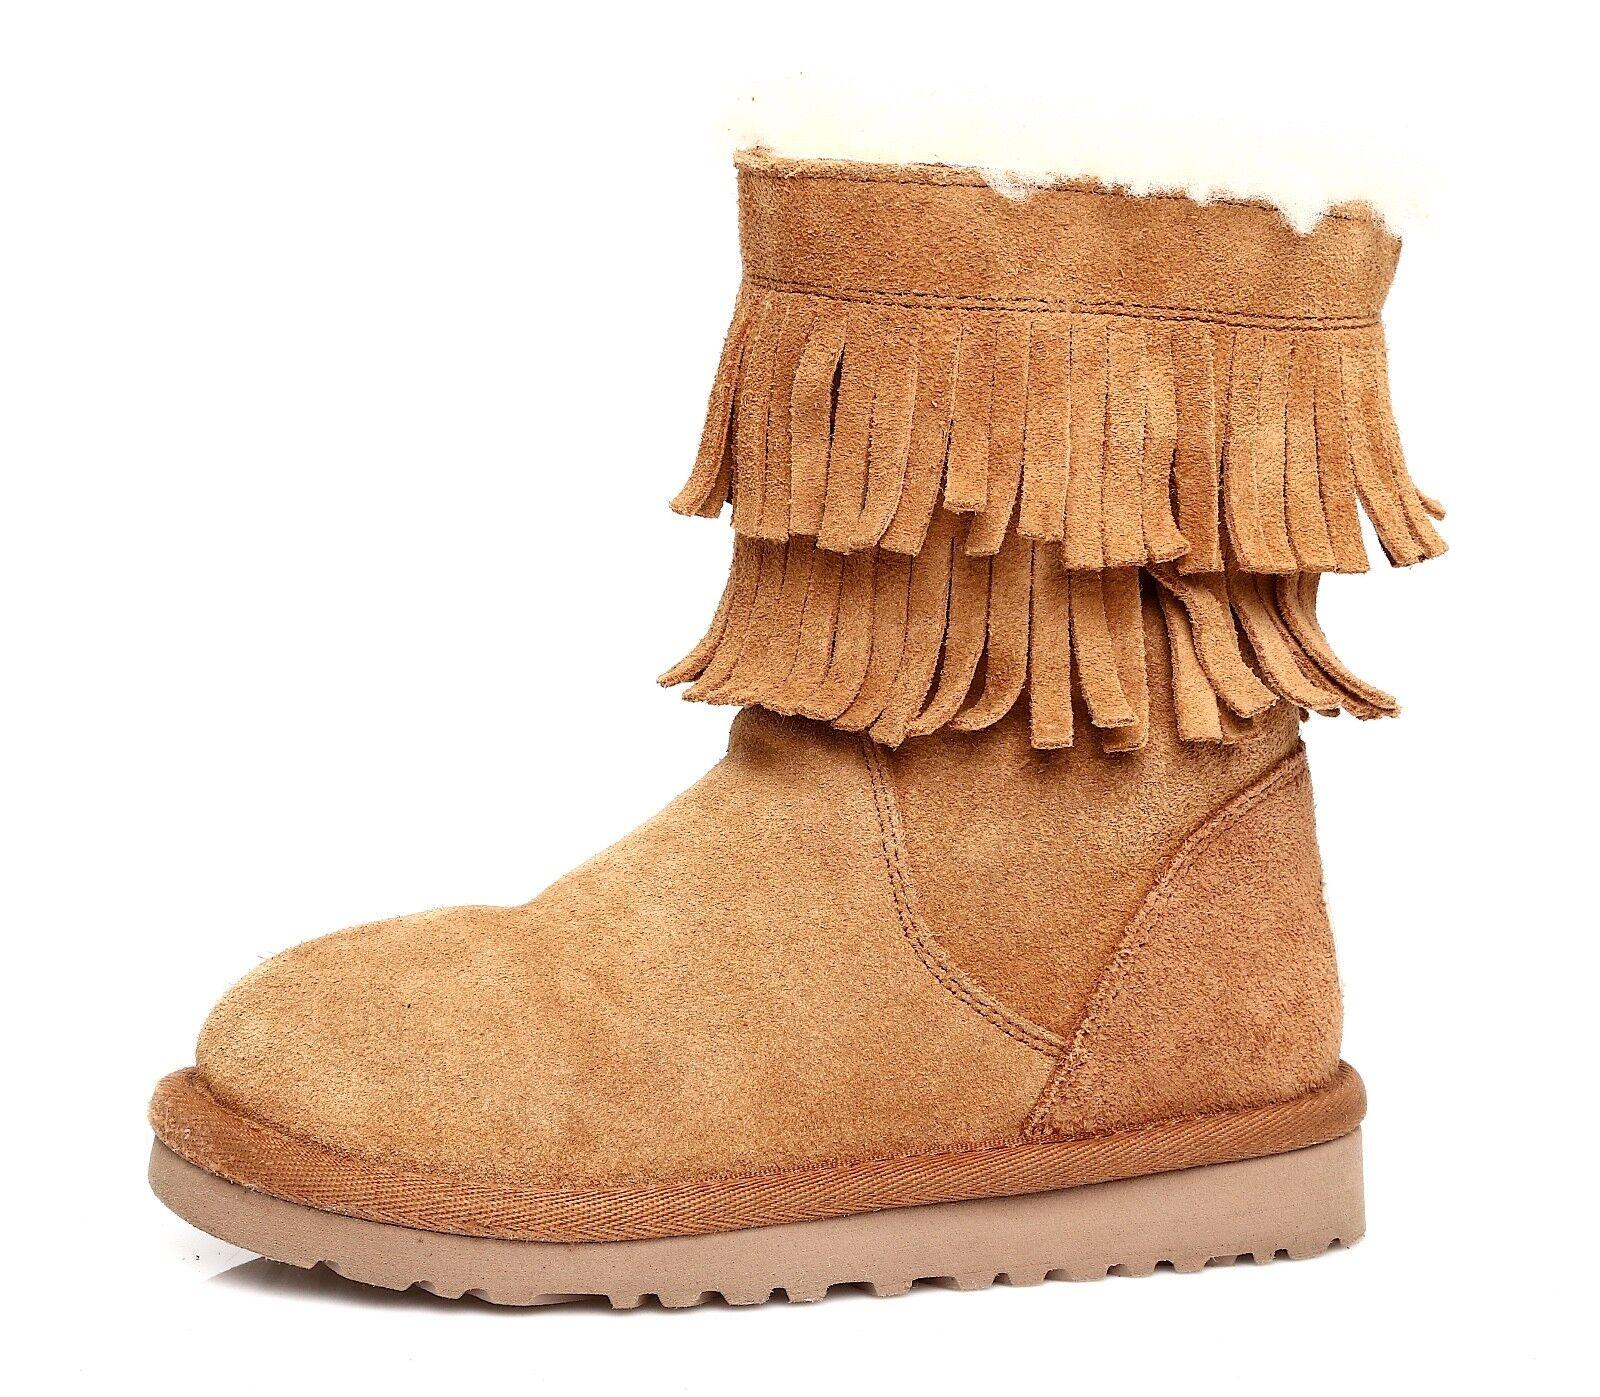 UGG Australia Scarlette Suede Chestnut Boot Girls Sz 11 T 4360 *